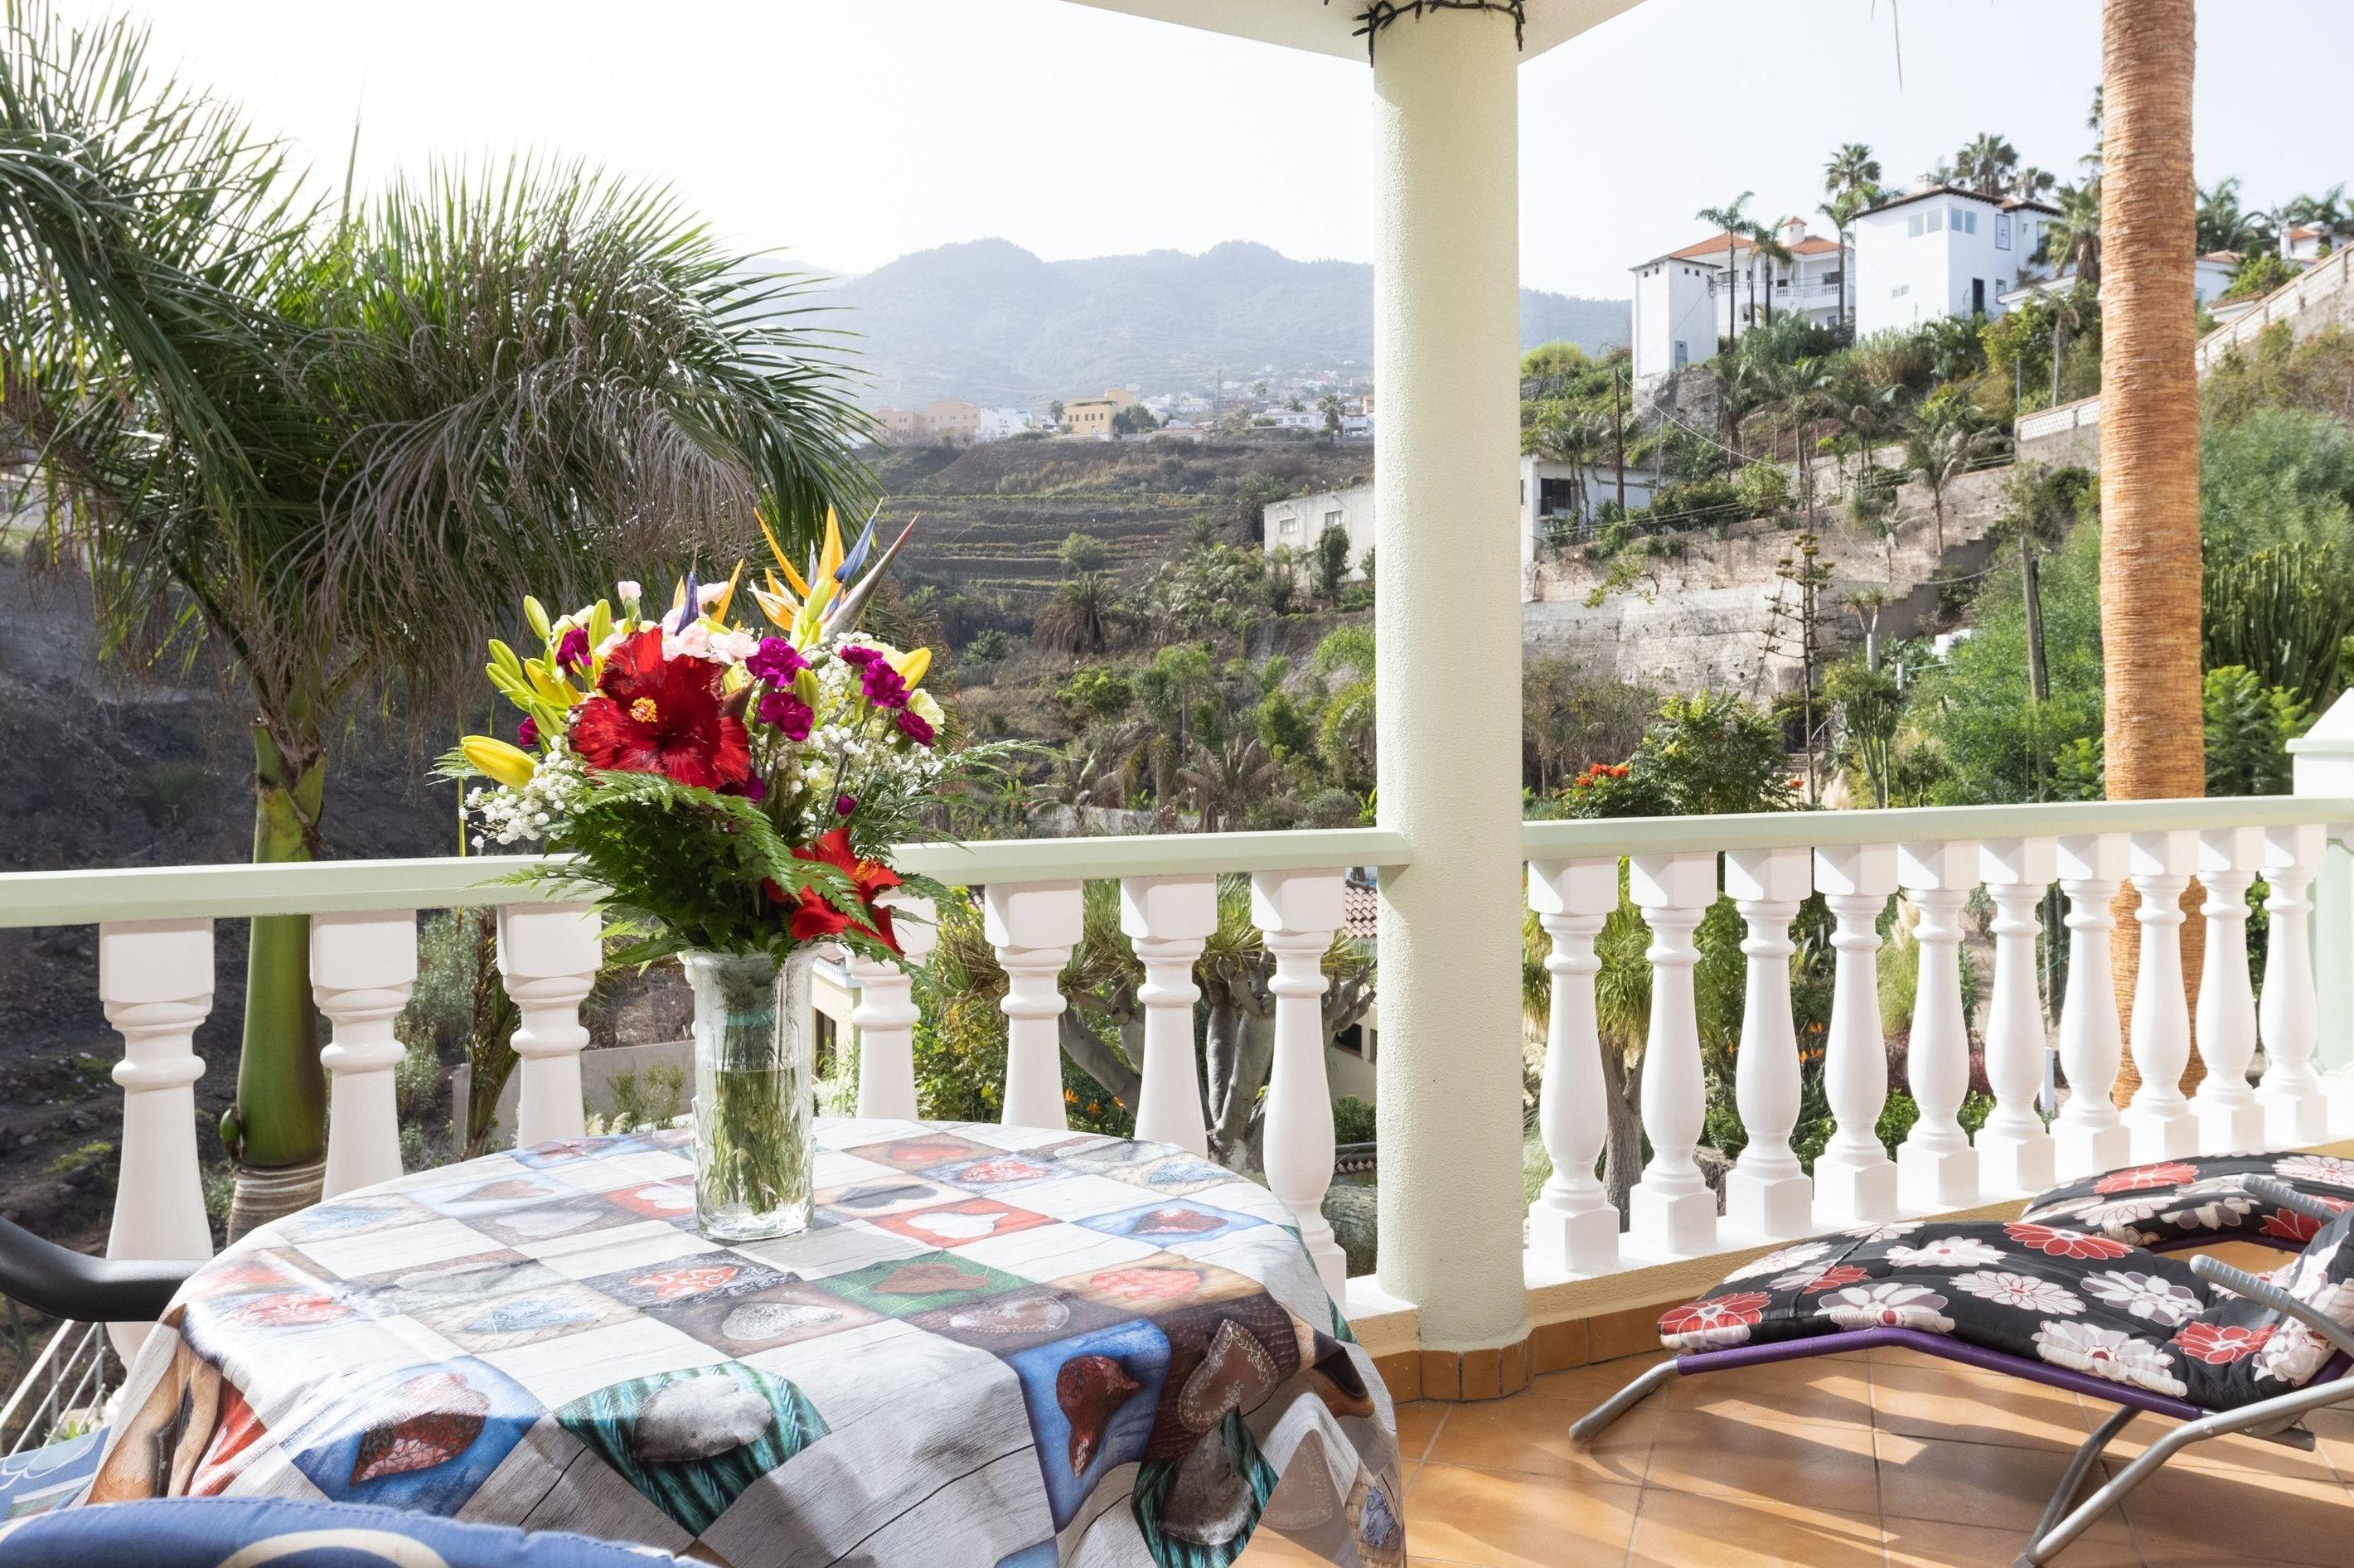 Appartement de vacances Fewo Atico Marazul, mit  Panorama- und Meerblick, Pool, Terrasse, Grill, Parkplatz und WLA (2492979), Santa Ursula, Ténérife, Iles Canaries, Espagne, image 7